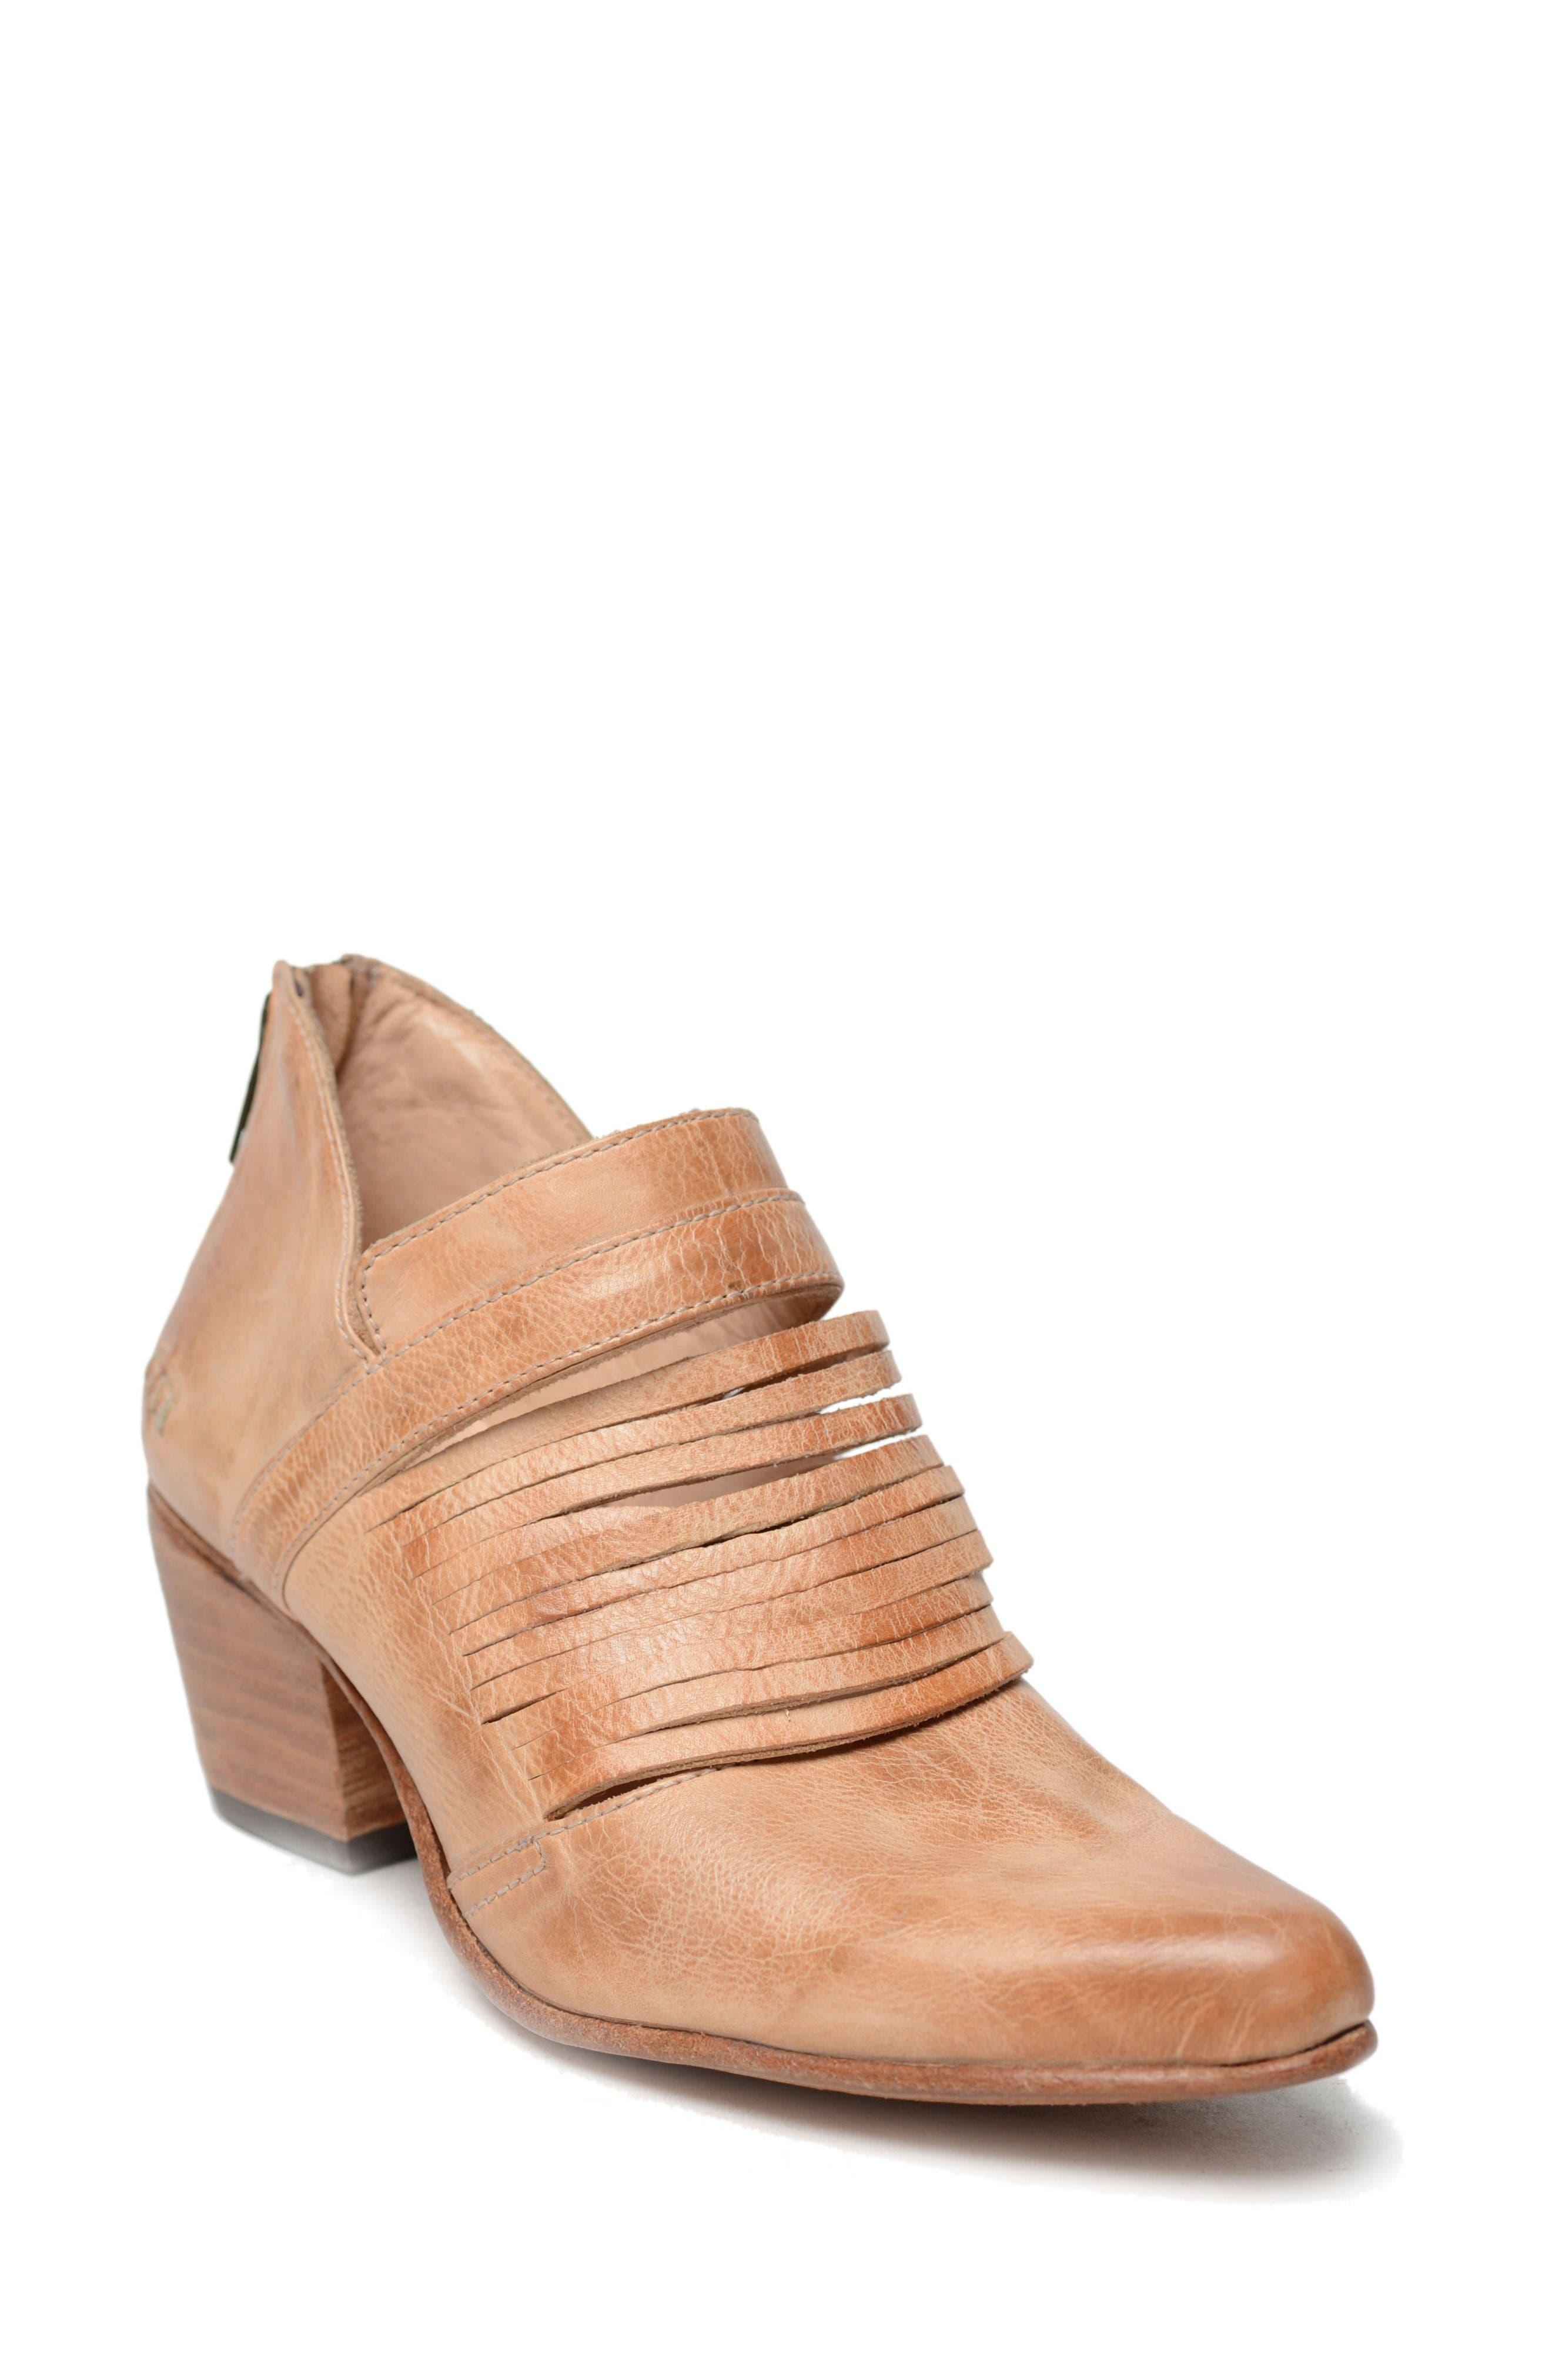 Trough Bootie,                         Main,                         color, Sand Rustic Leather